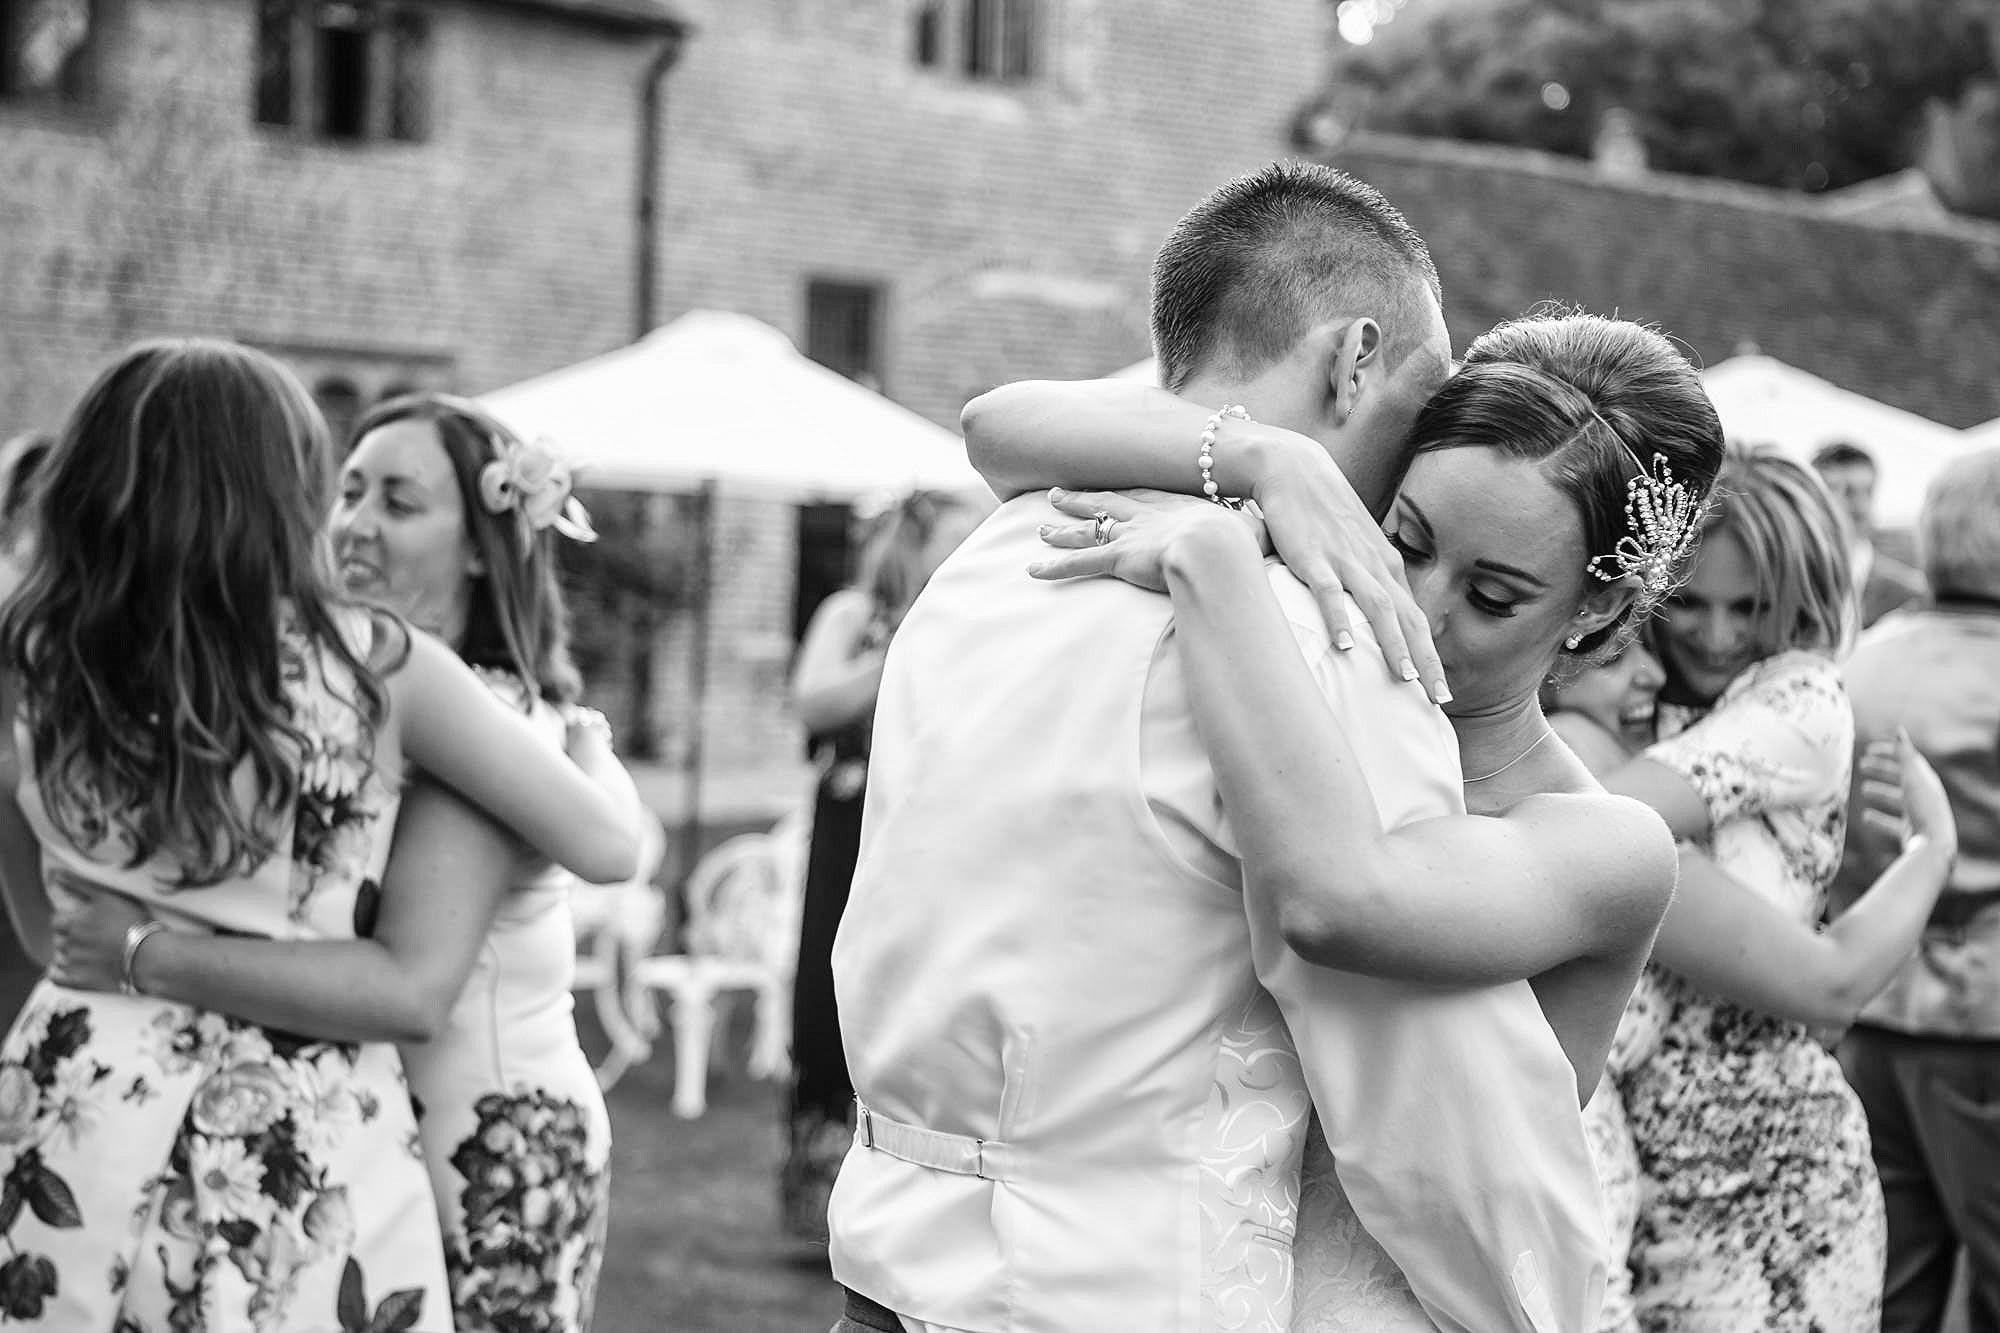 Leez Priory Weddings dances